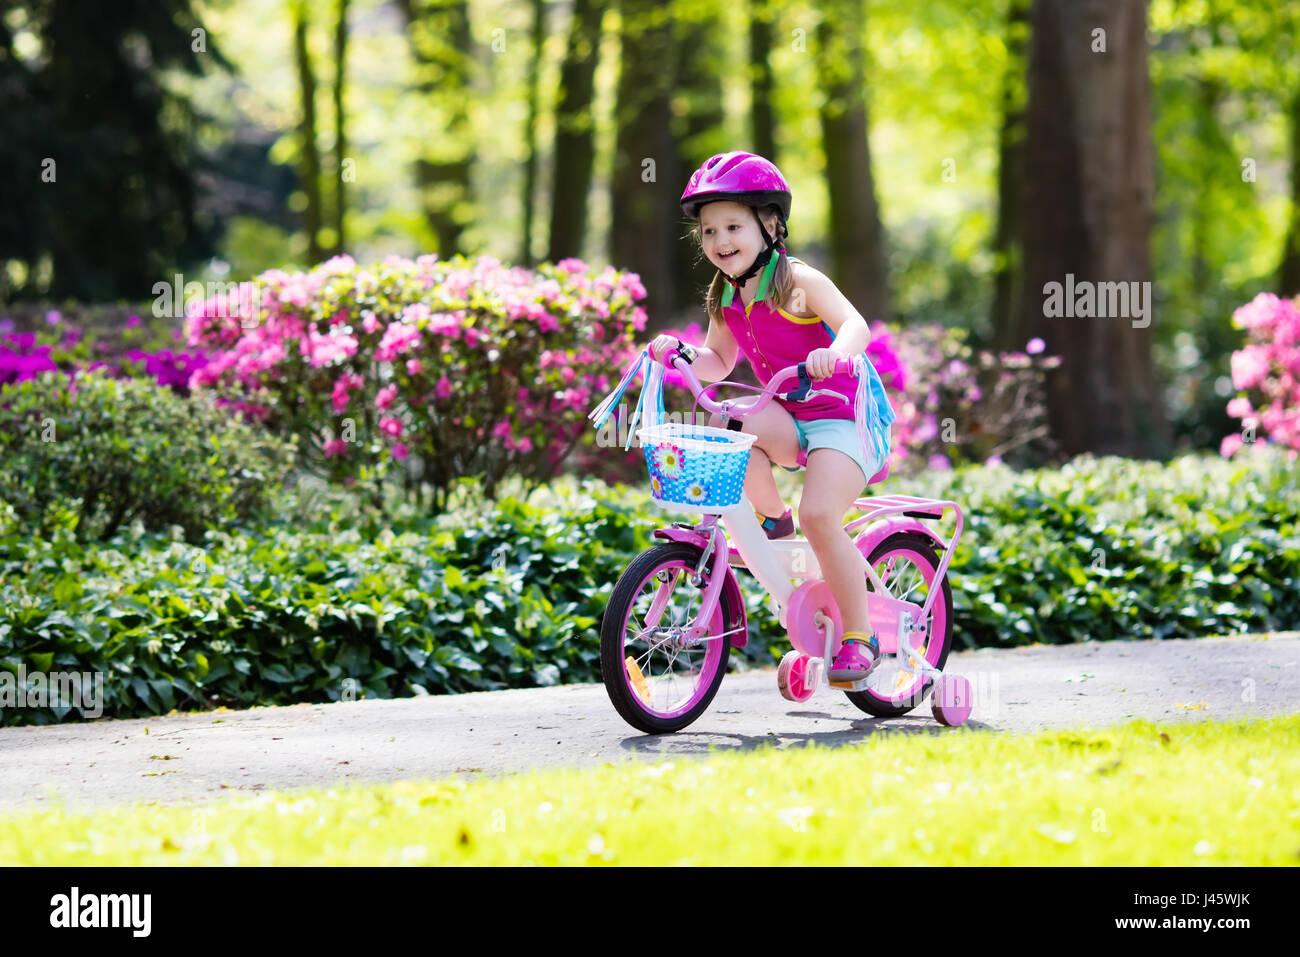 kinder reiten fahrrad kind auf dem fahrrad im sonnigen. Black Bedroom Furniture Sets. Home Design Ideas